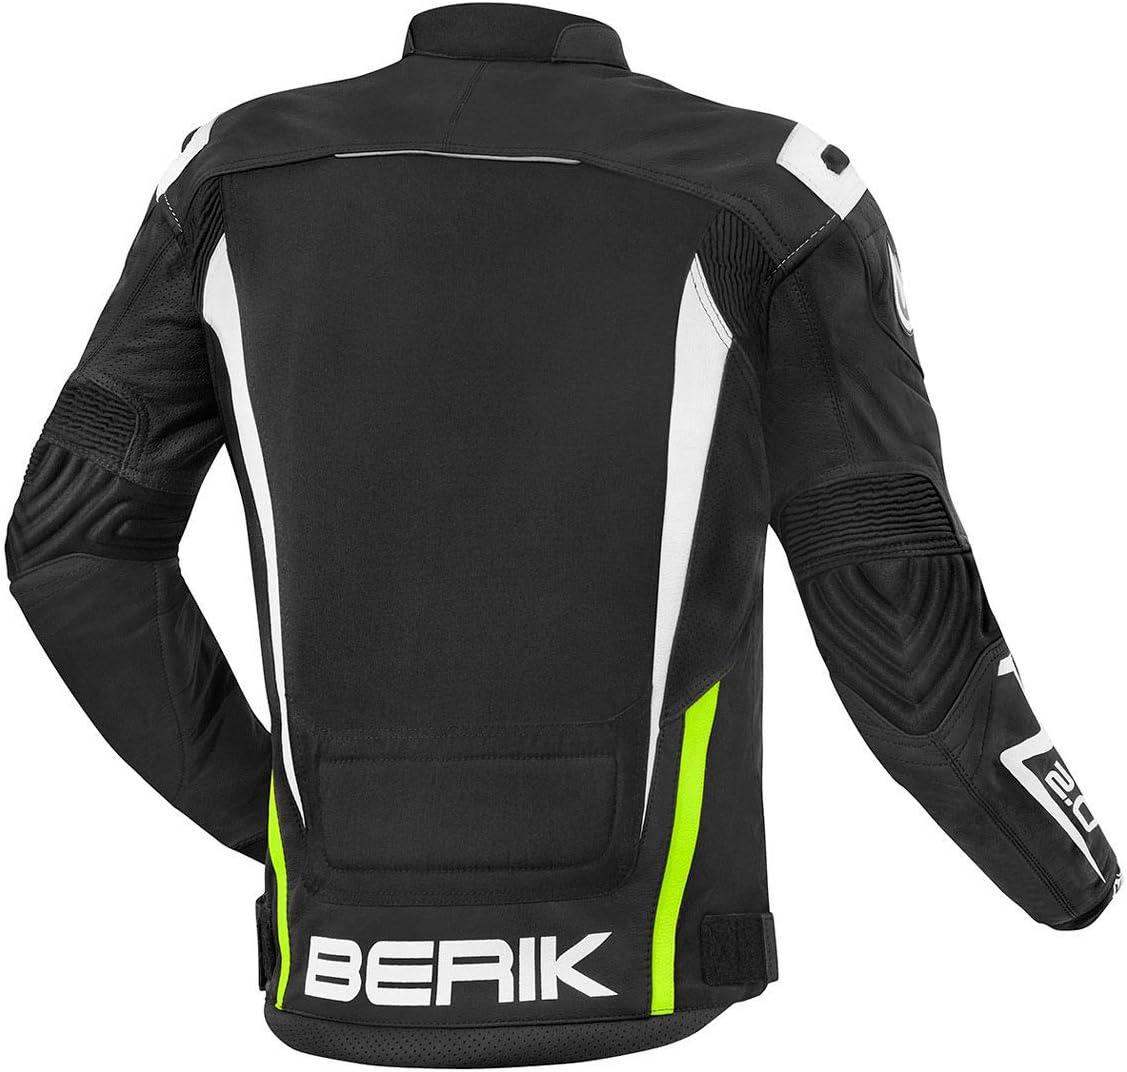 Giacca in pelle da motociclista Berik Radic